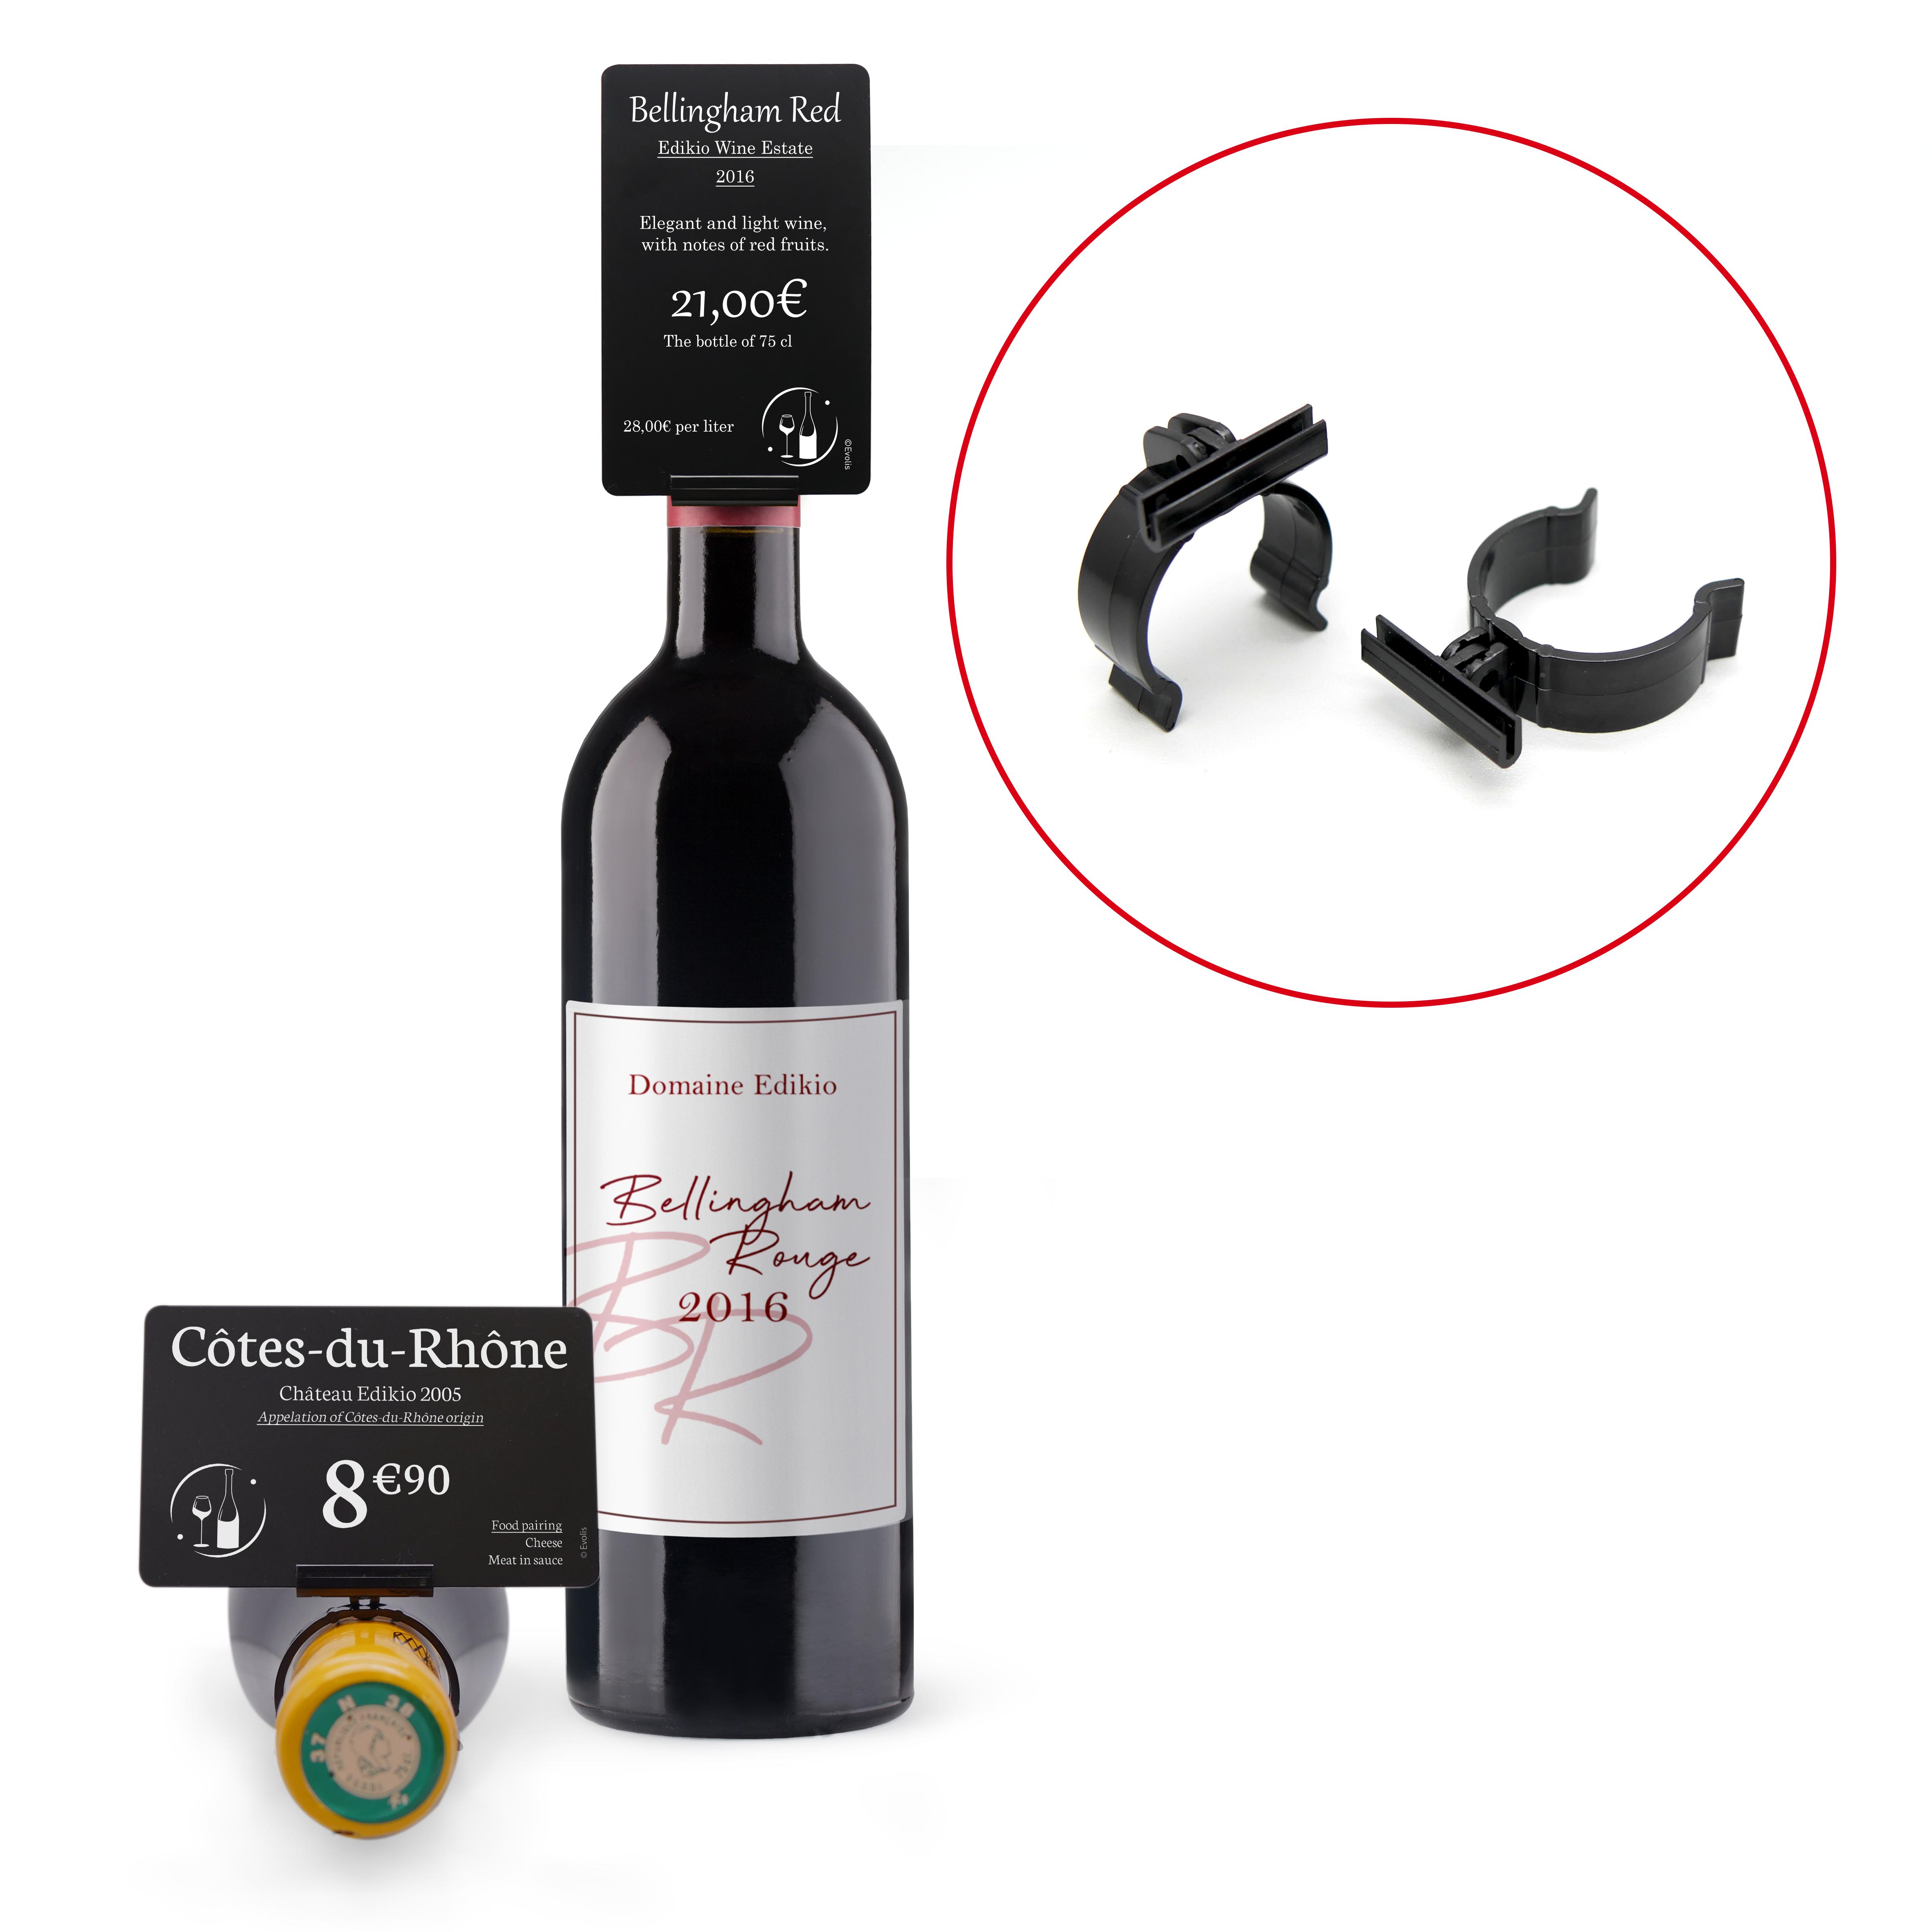 Edikio wine